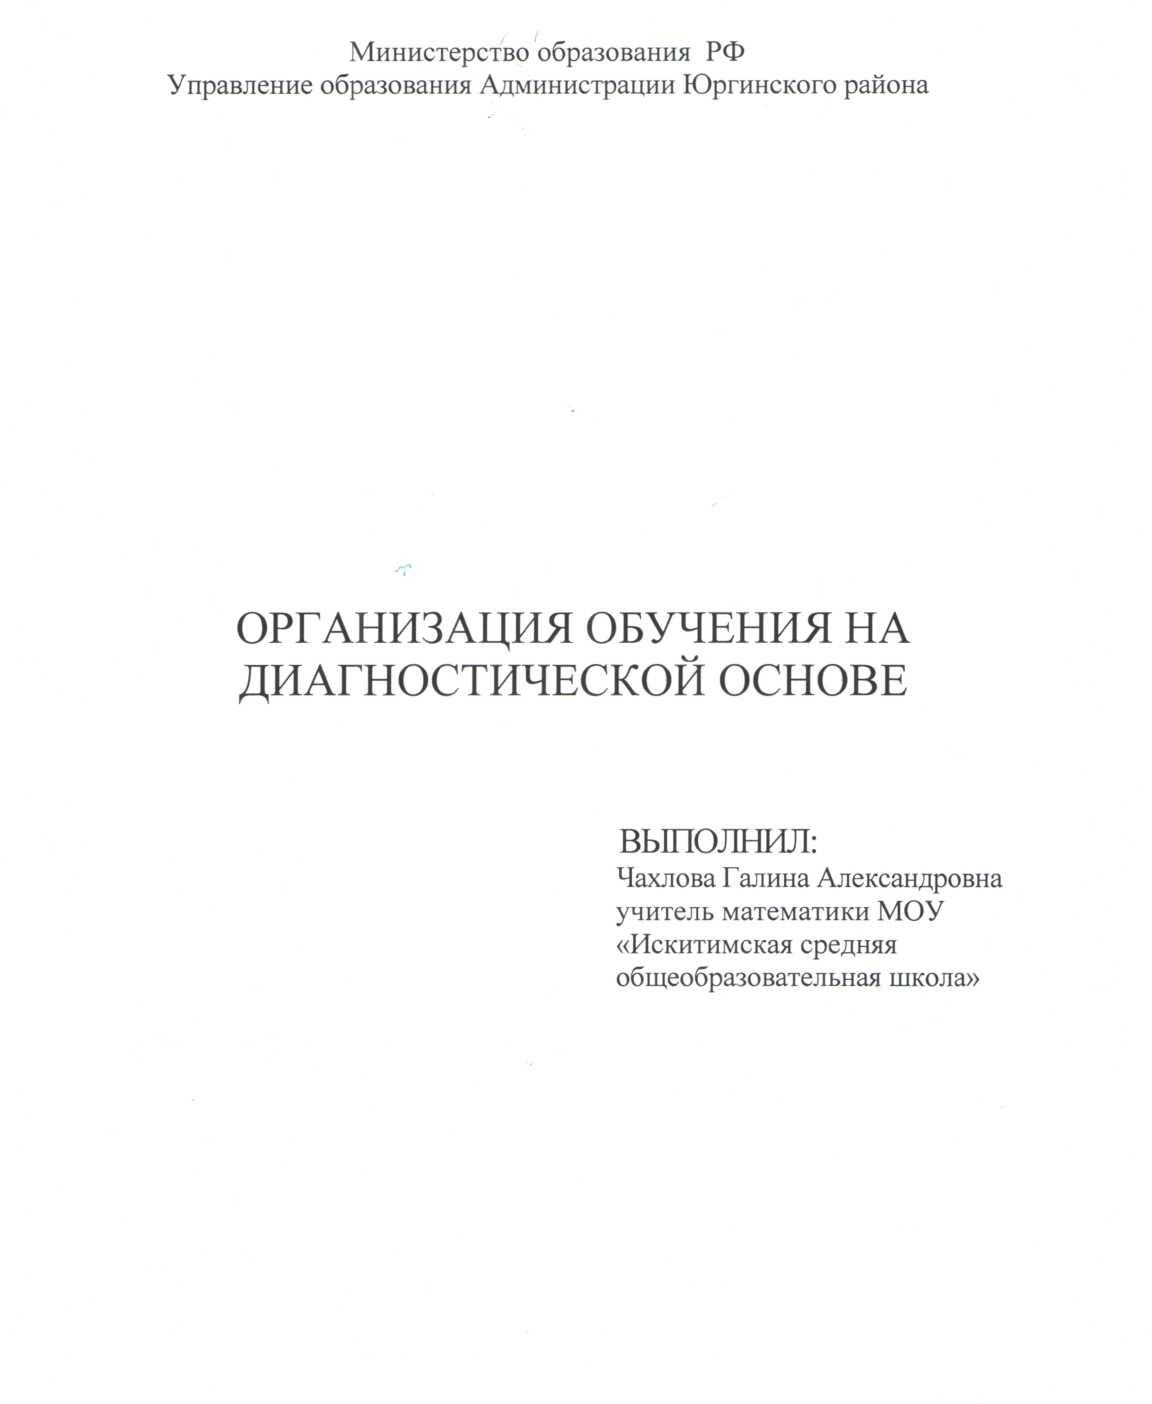 C:\Documents and Settings\Lanos\Рабочий стол\media\image1.jpeg